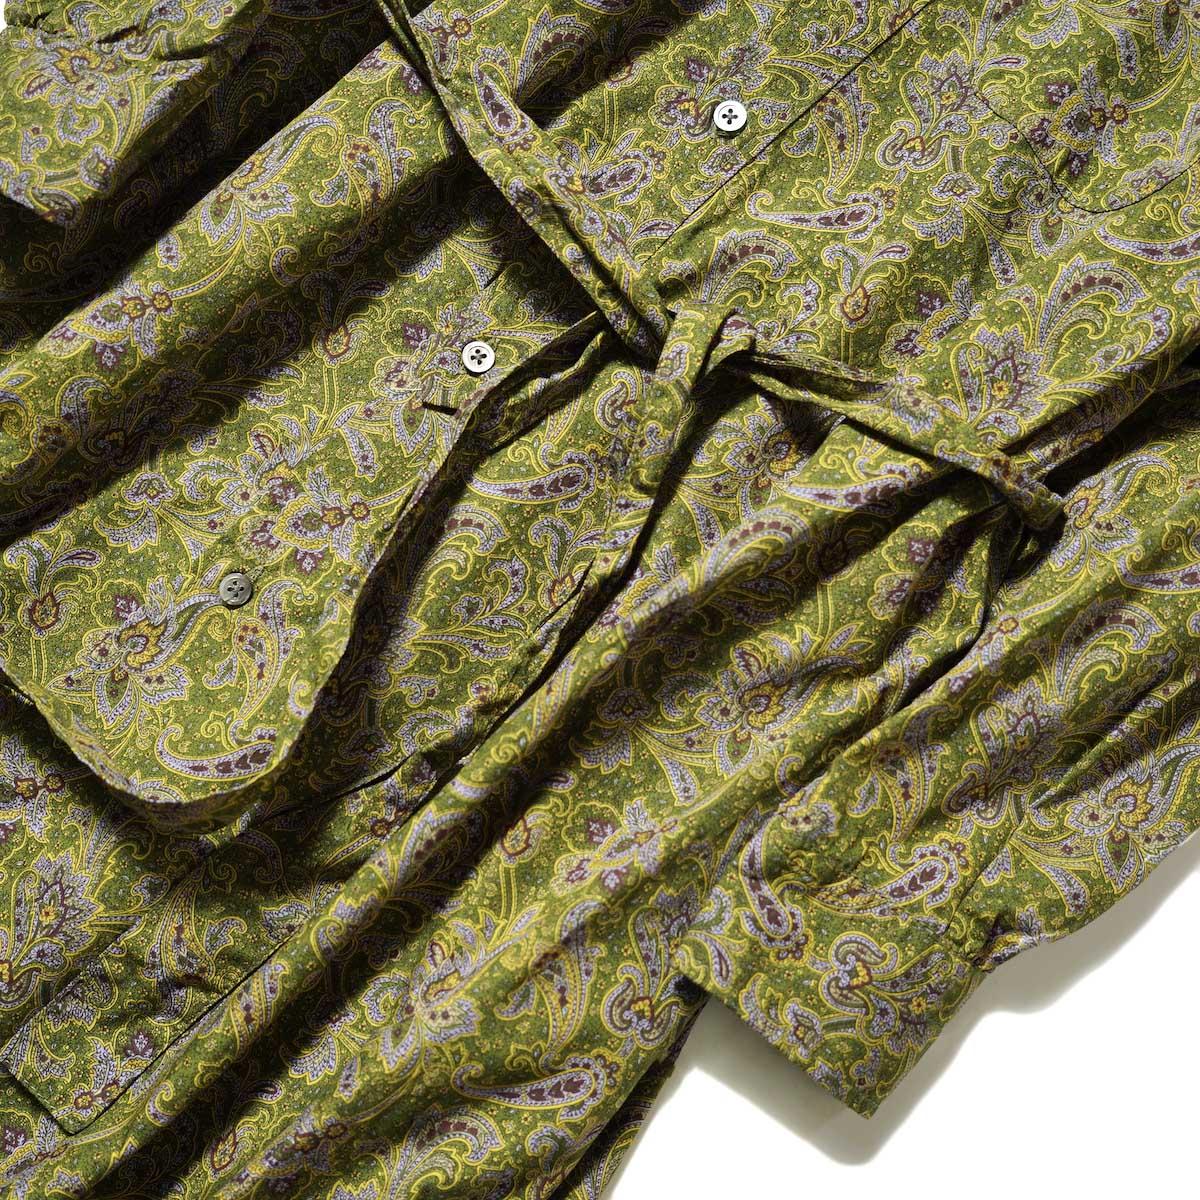 Engineered Garments / Banded Collar Dress (Olive / Purple Cotton Paisley Print) ウエスト・袖